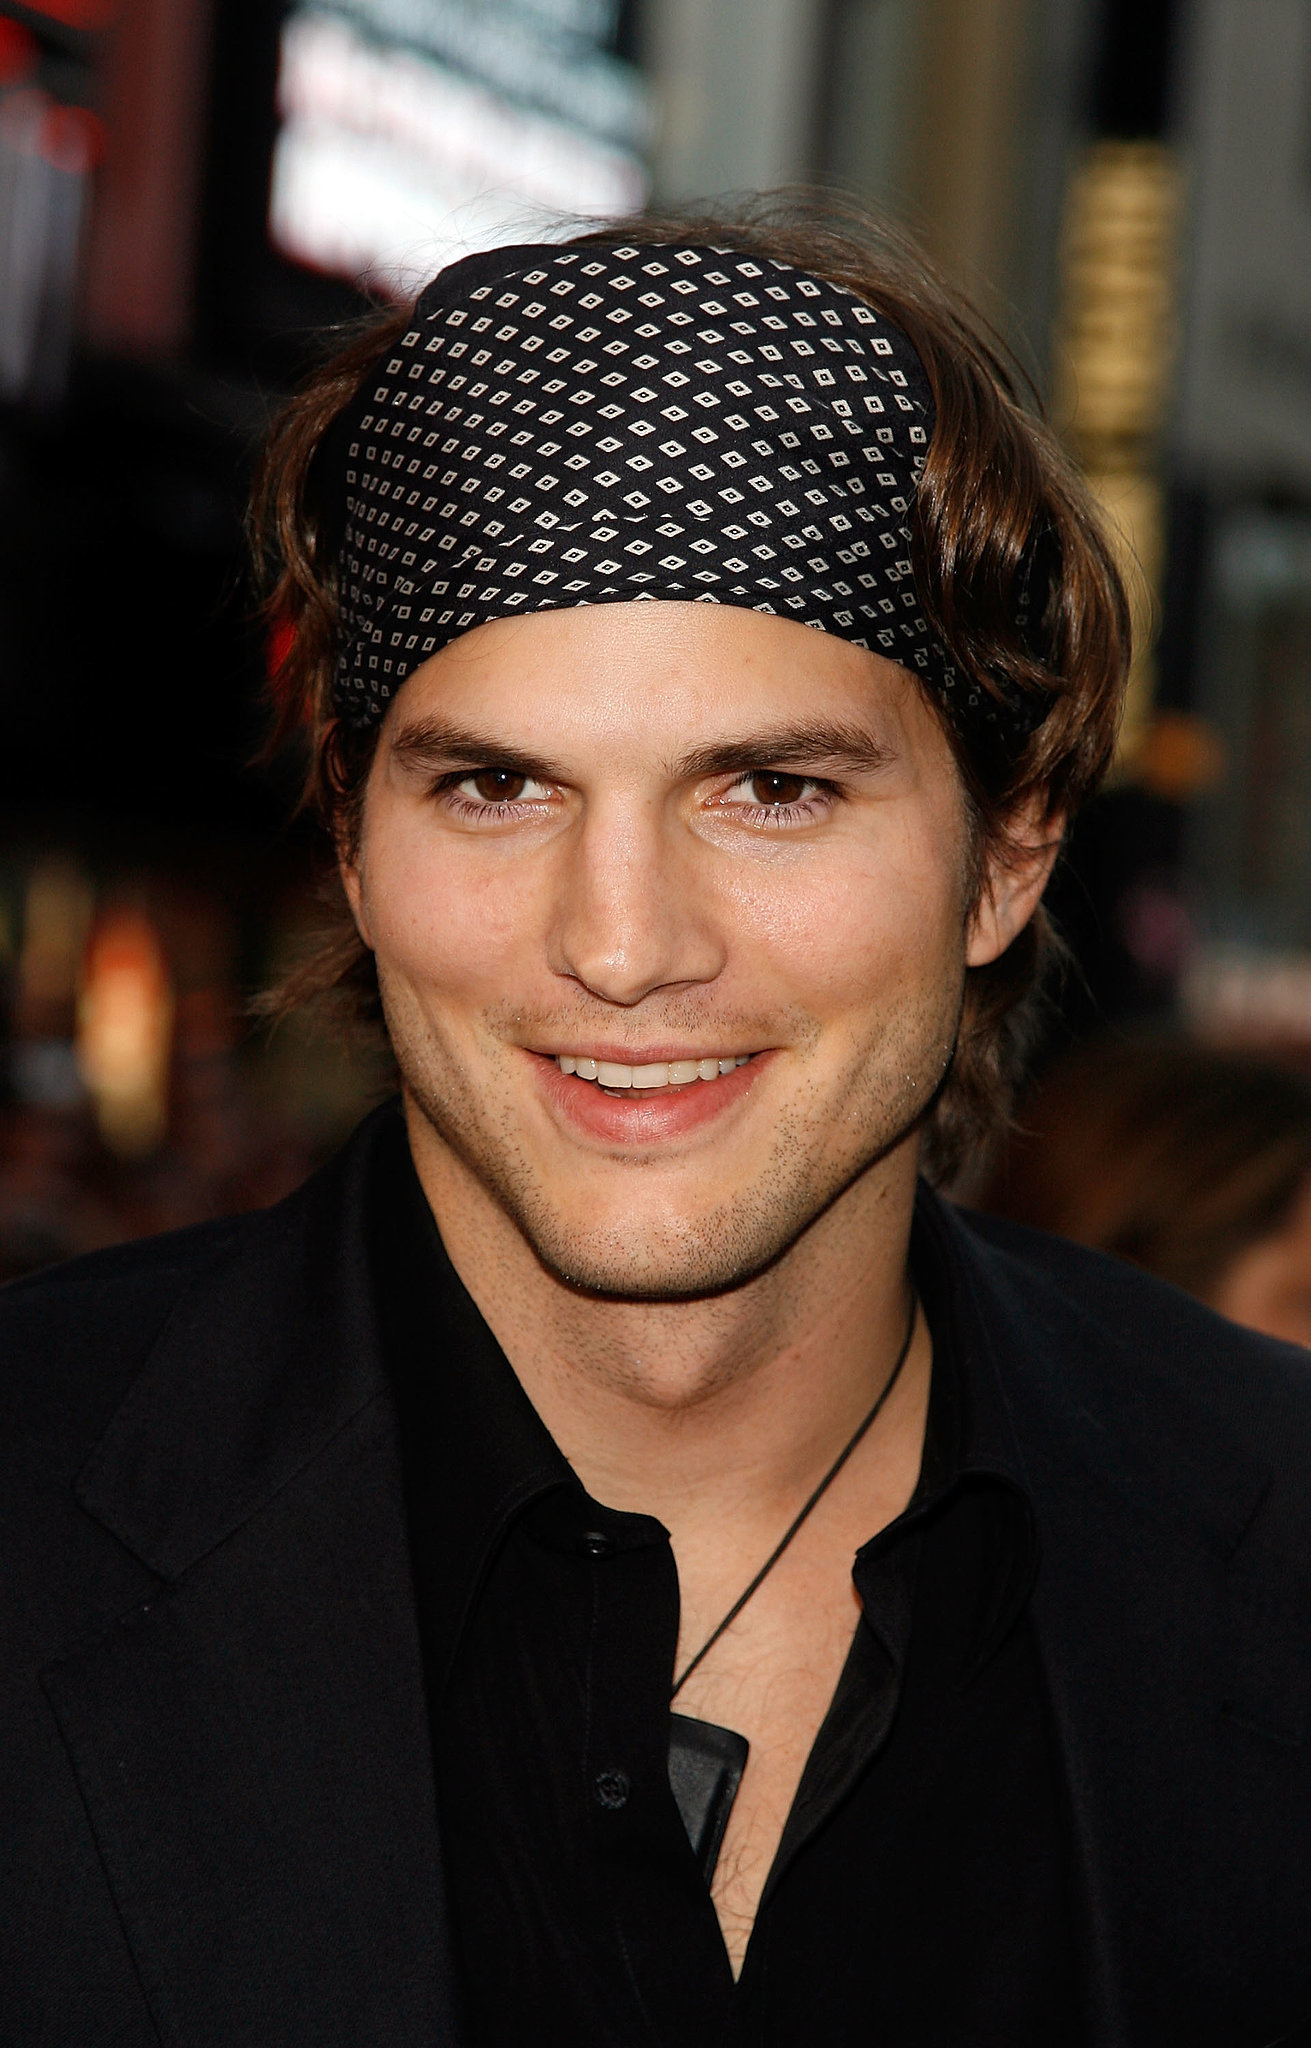 But wait. This headband . . .